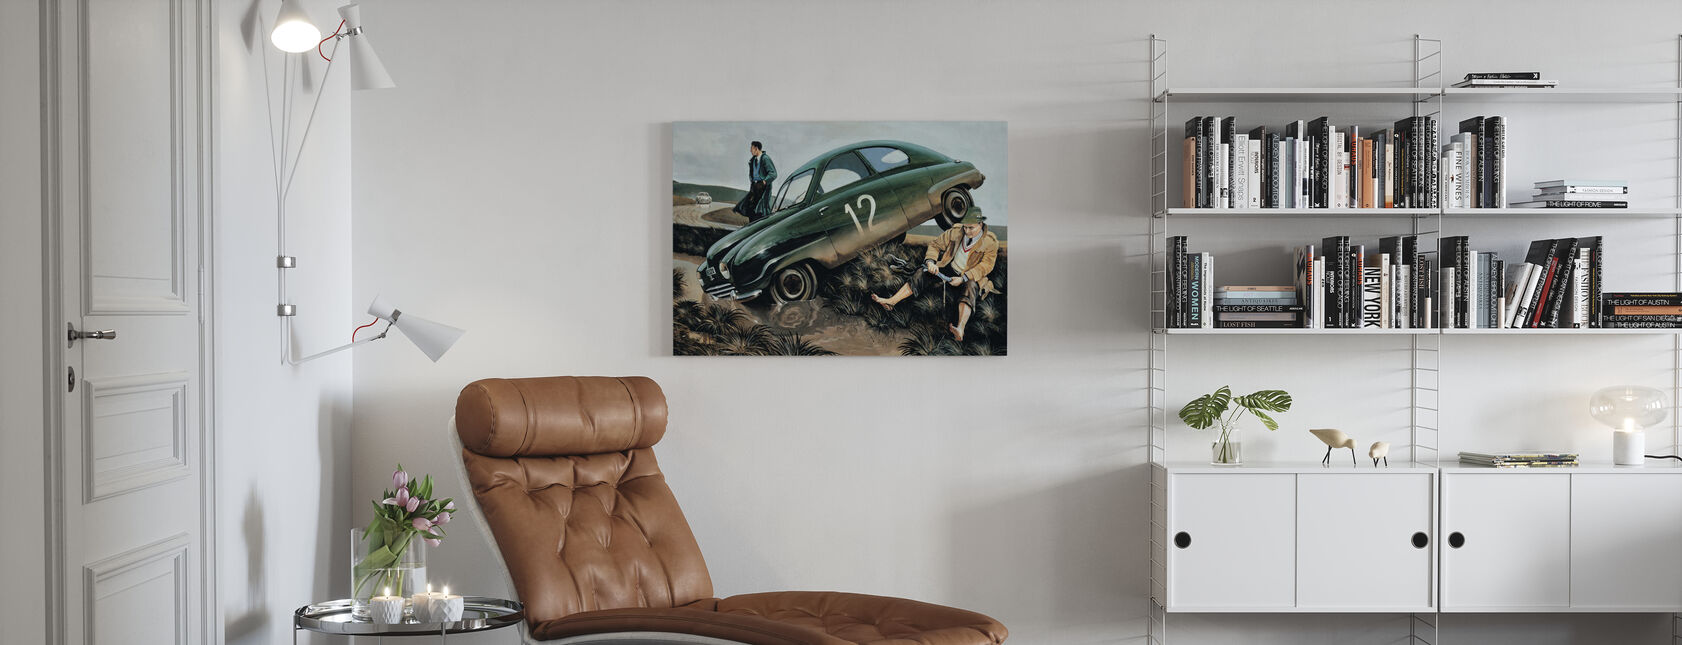 Carlsson Auto - Canvastaulu - Olohuone